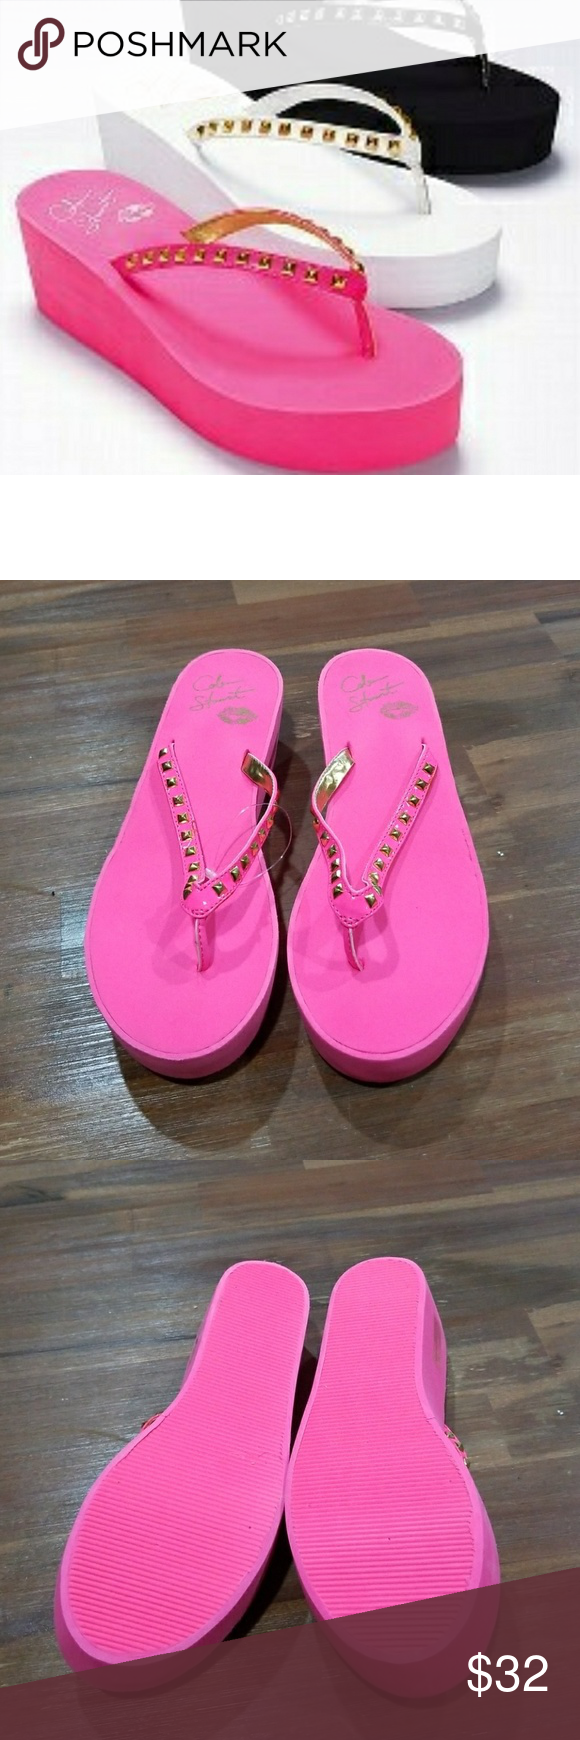 65a0f5ba62251 Victoria s Secret Colin Stuart Gold stud Hot Pink8 BY Colin Stuart these  are created for Victoria Secret